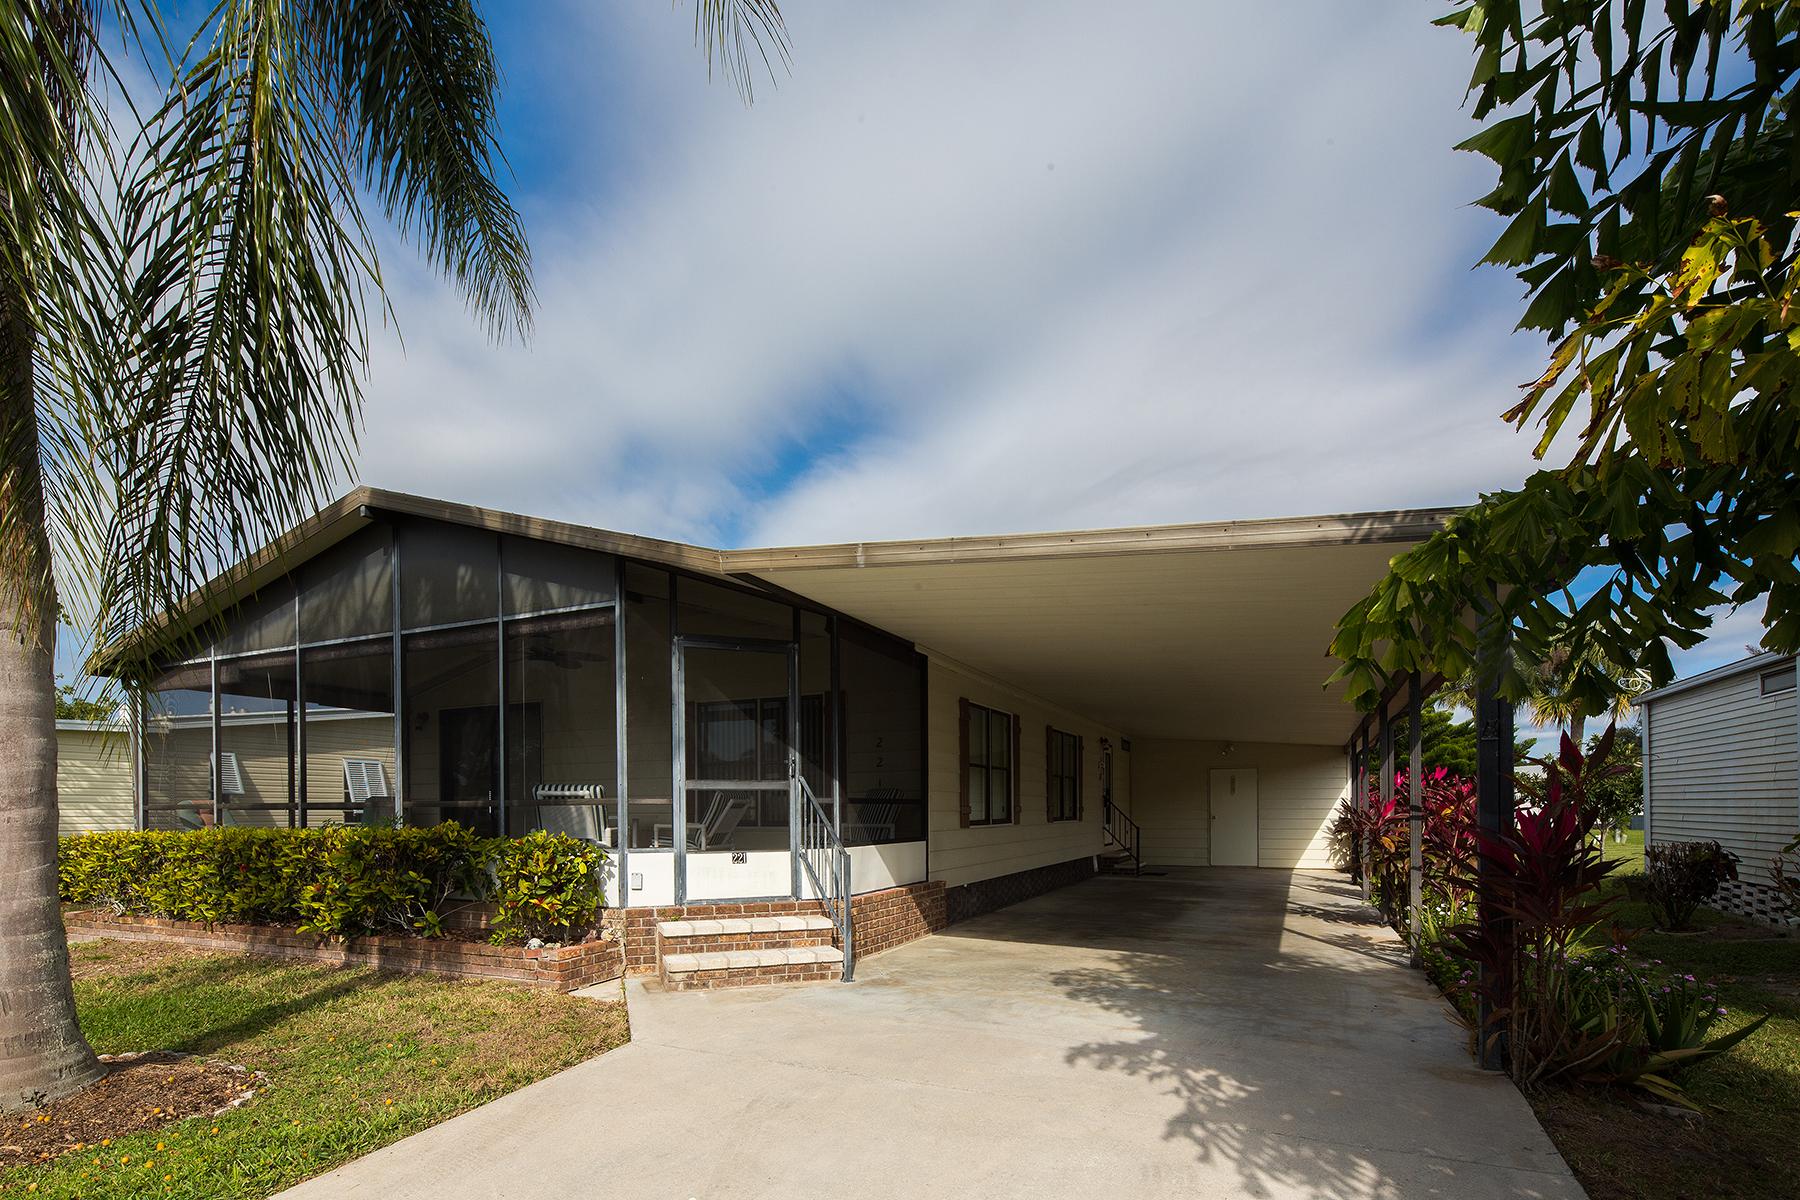 独户住宅 为 销售 在 MARCO SHORES - FISHTAIL PALM 221 Fishtail Palm Ln Naples, 佛罗里达州 34114 美国